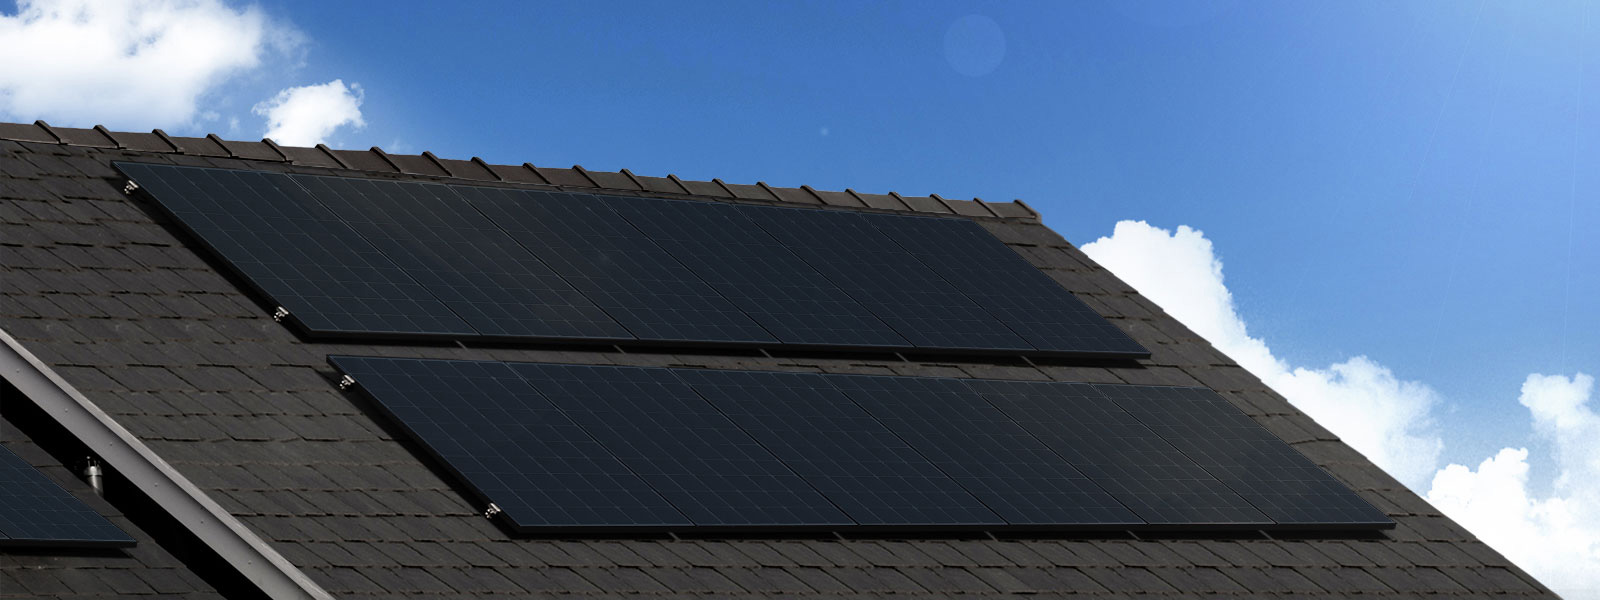 LG solar panel roof mount installation